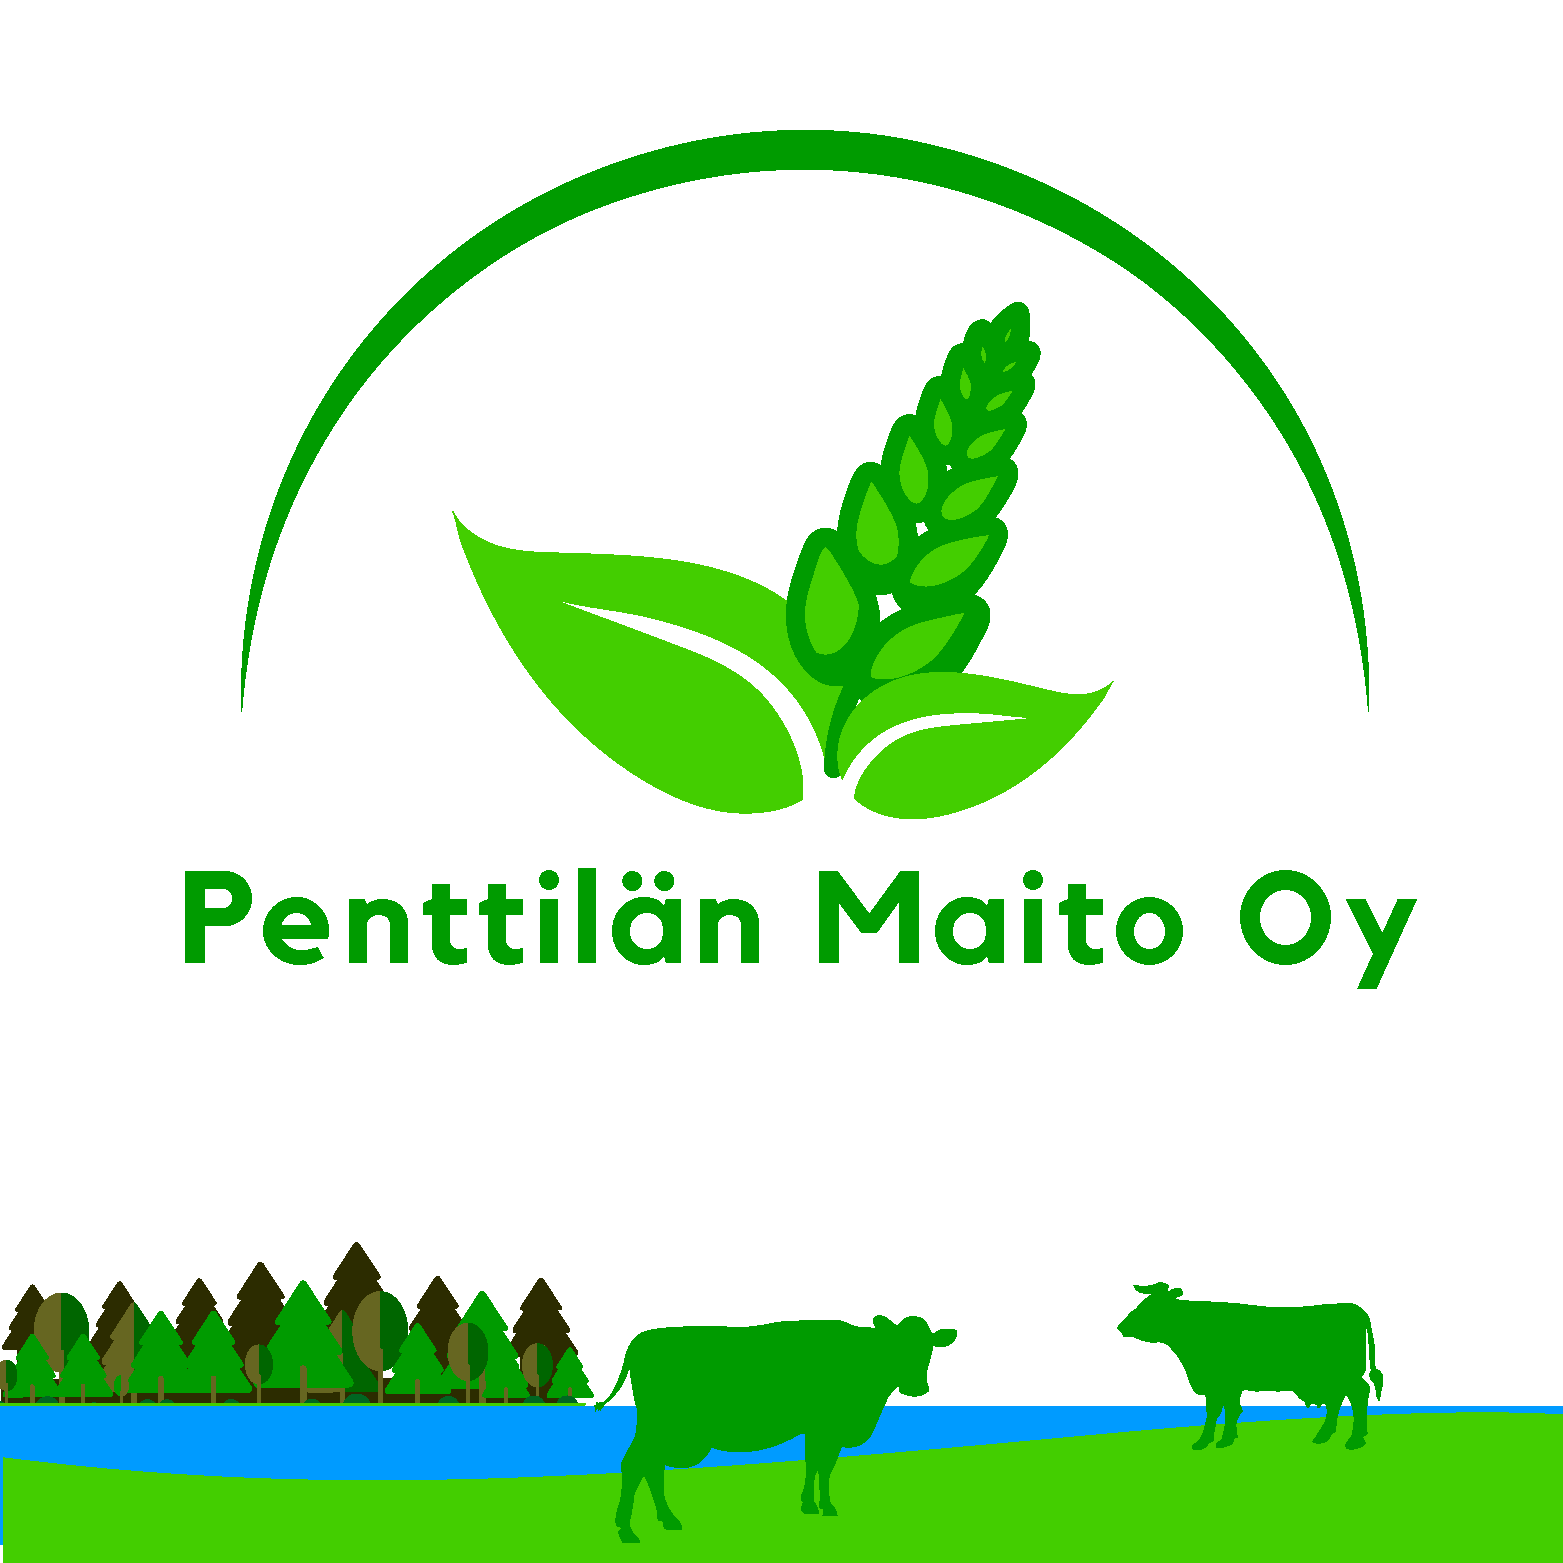 Penttilän Maito Oy